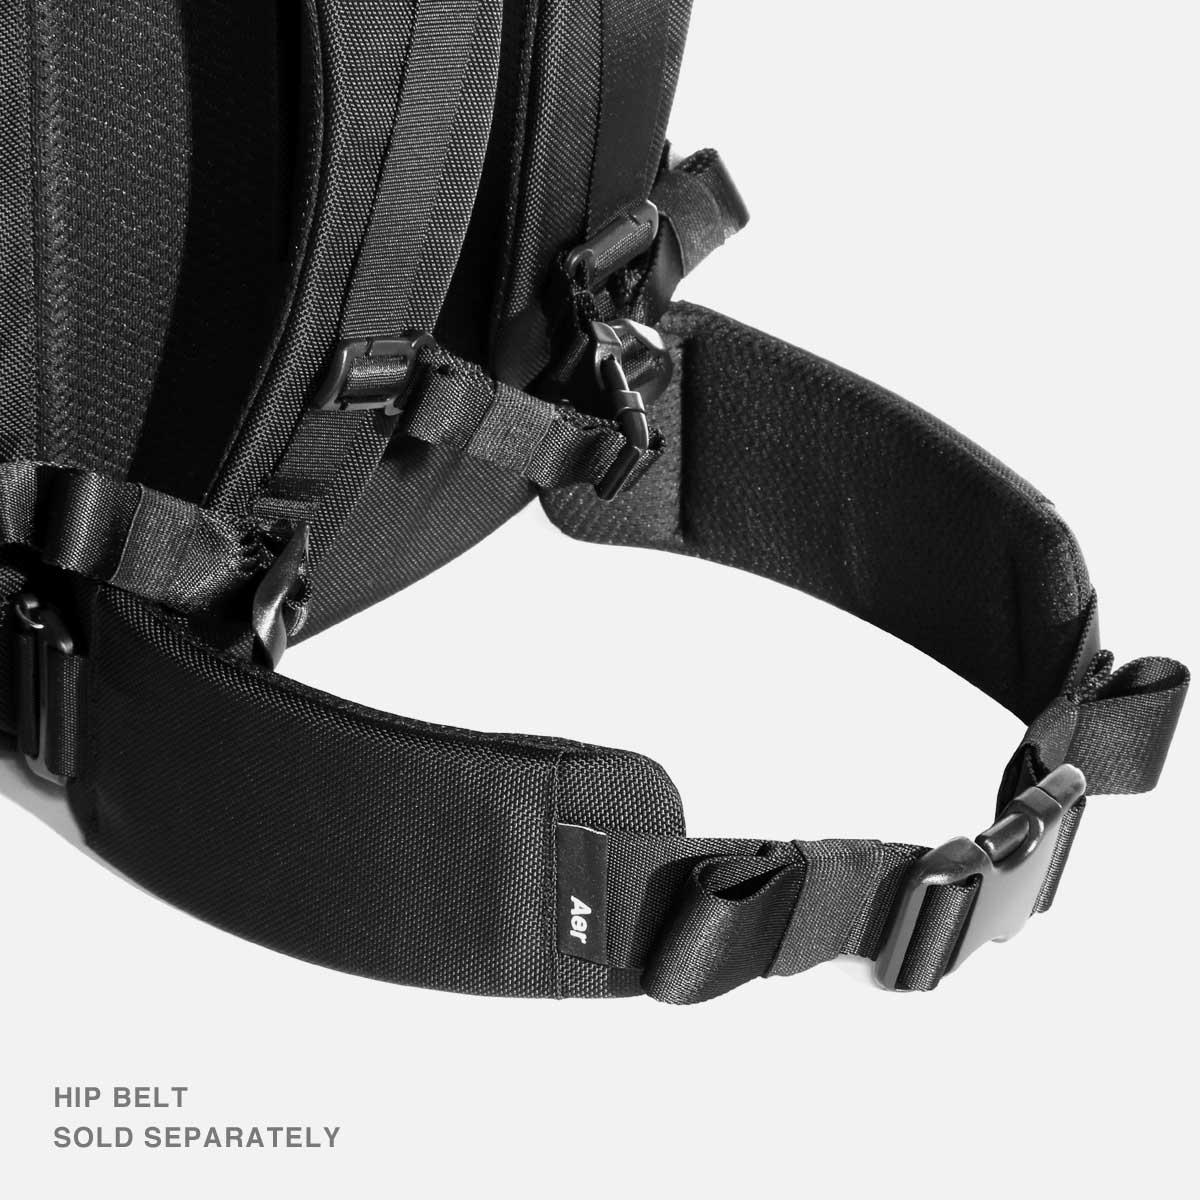 AER21022_travelpack2small_hipbelt.jpg